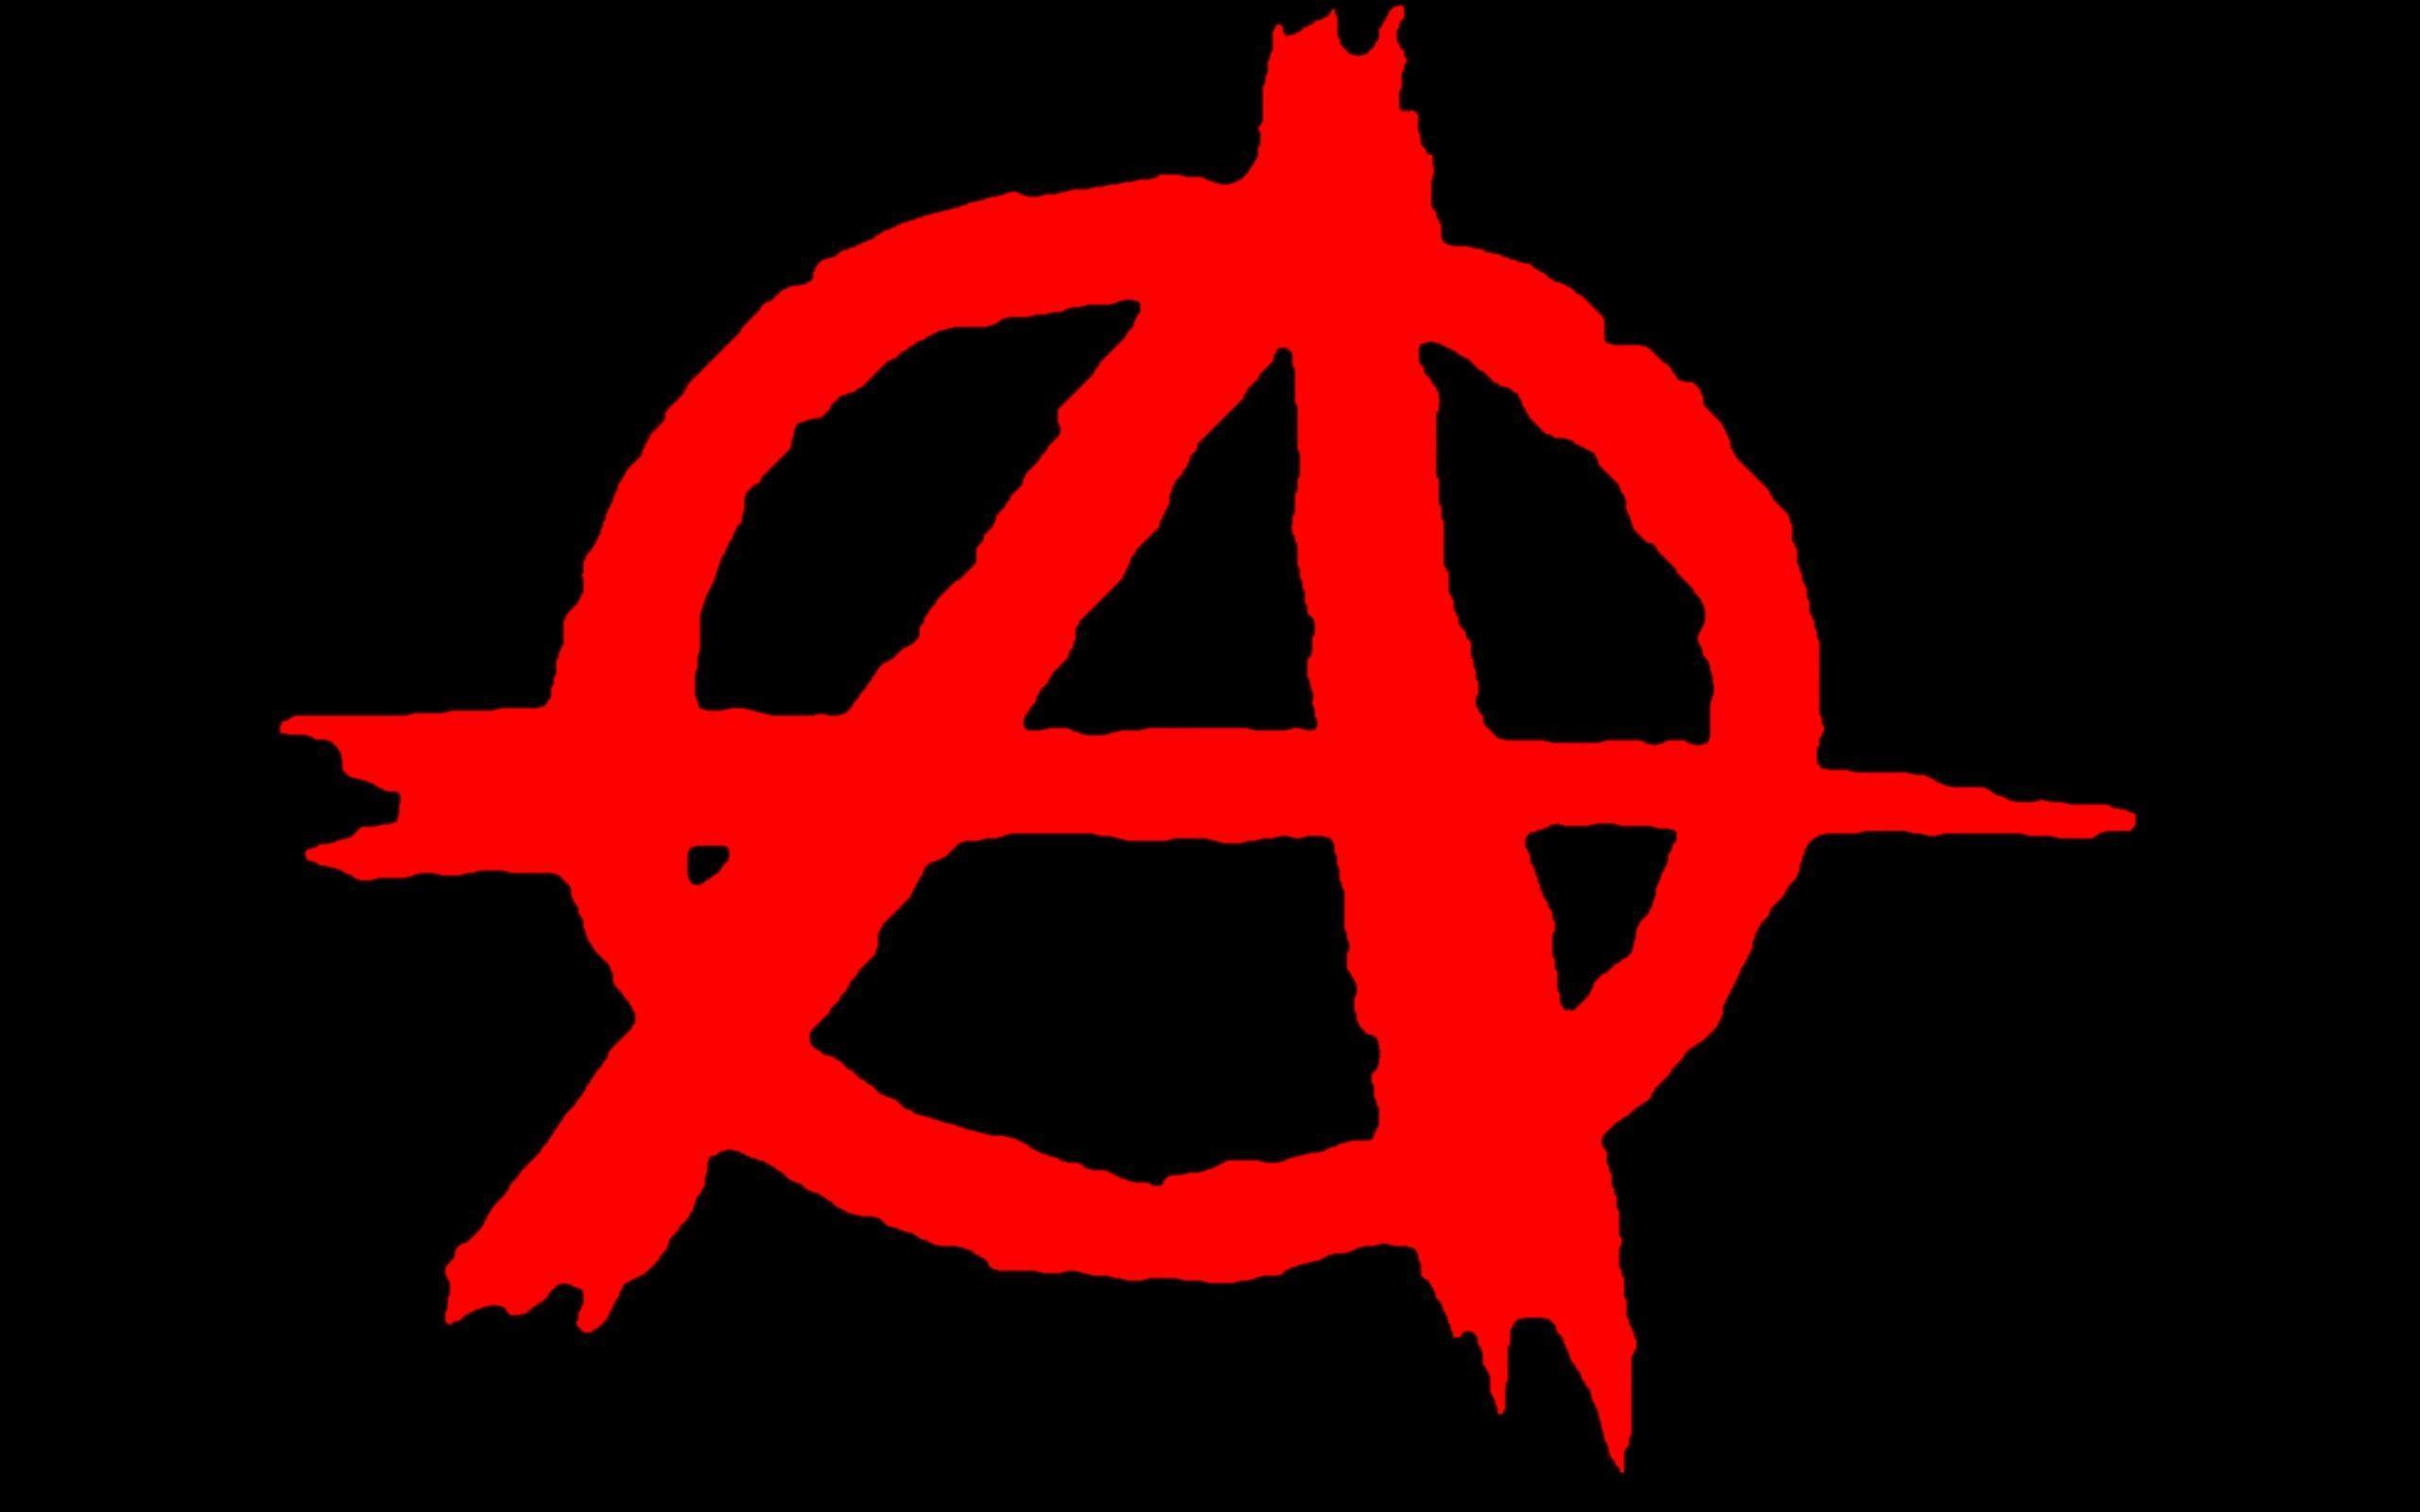 Symbol Of Love Desktop Wallpaper : Anarchy Symbol Wallpapers - Wallpaper cave